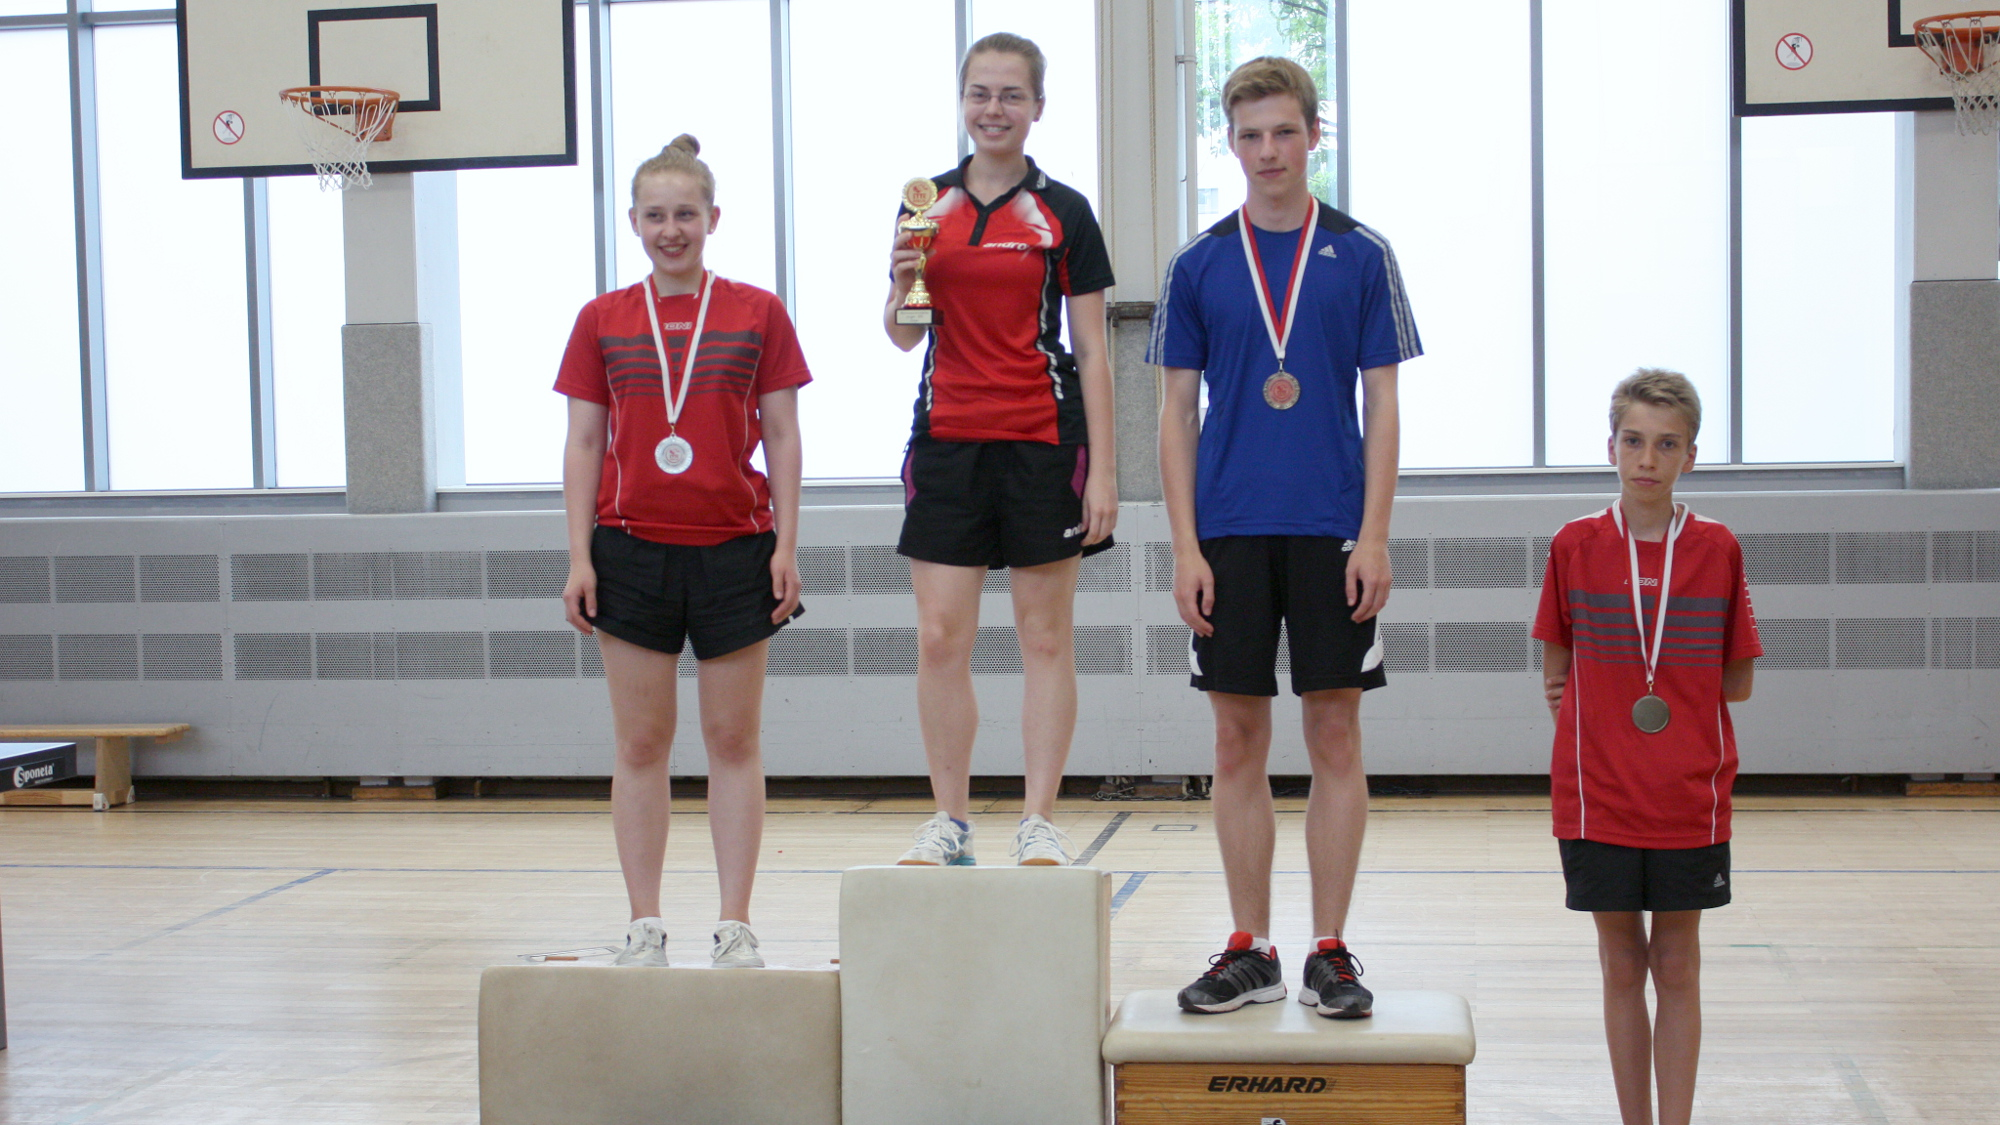 Das Siegertreppchen der Jugend: 1. Platz: Svenja, 2. Platz: Sophie, 3. Platz: Jonas. Außerdem der stärkste A-Schüler: Ludwig.